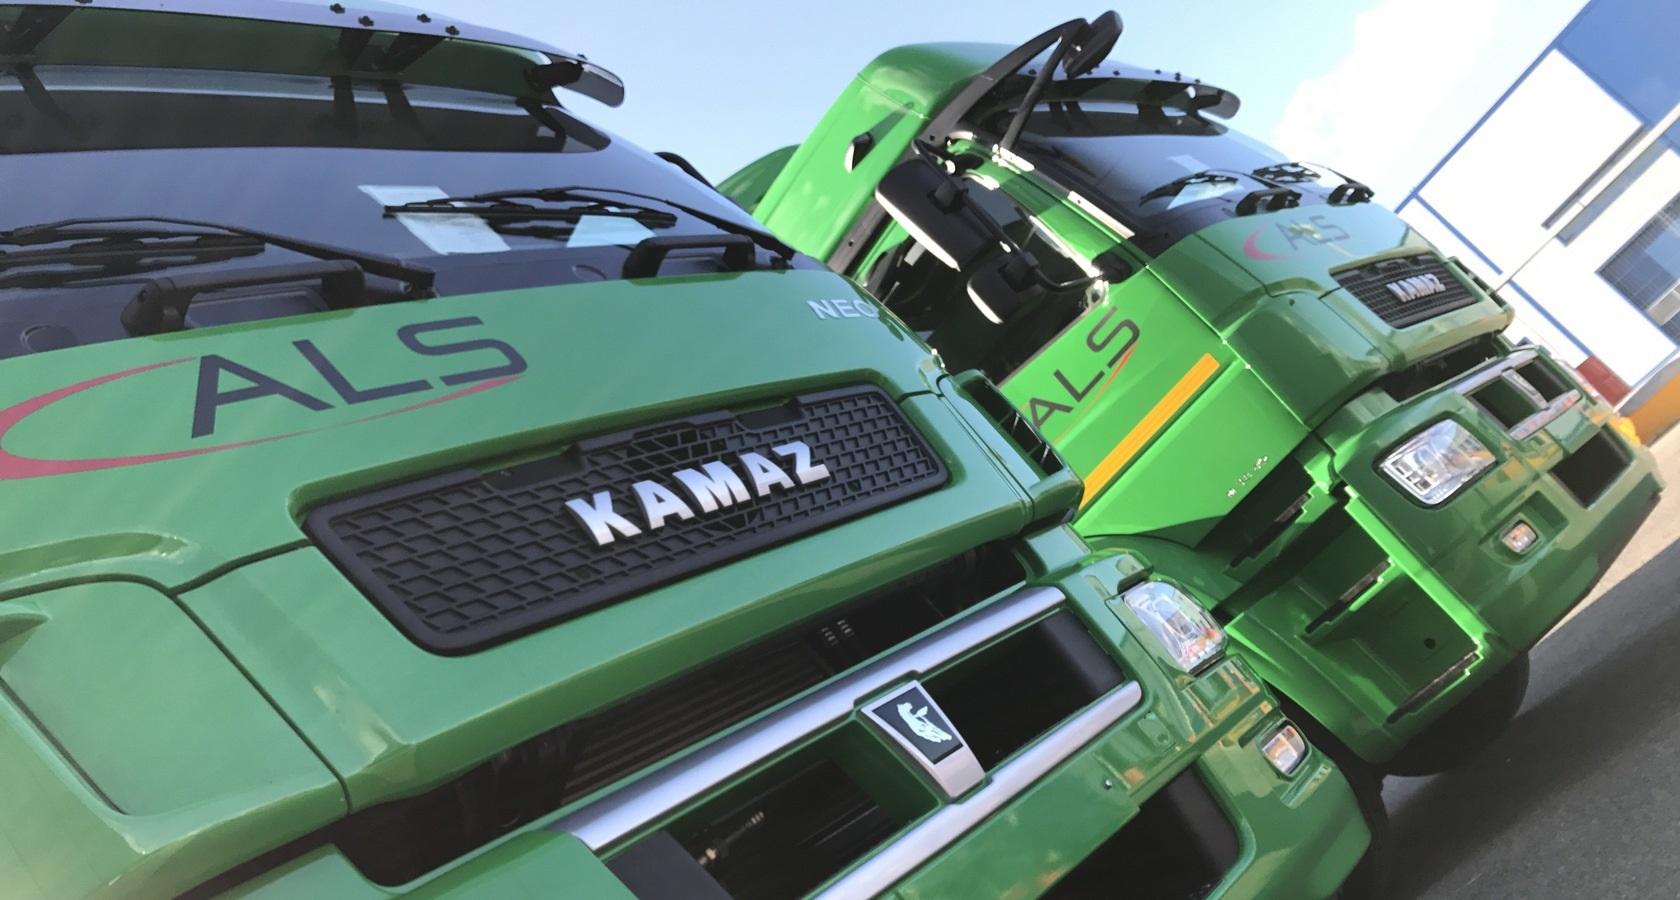 В 2017 году «Автологистика-транс» уже приобрела в лизинг 36 тягачей Камаз Neo (фото: «КамАЗ»)